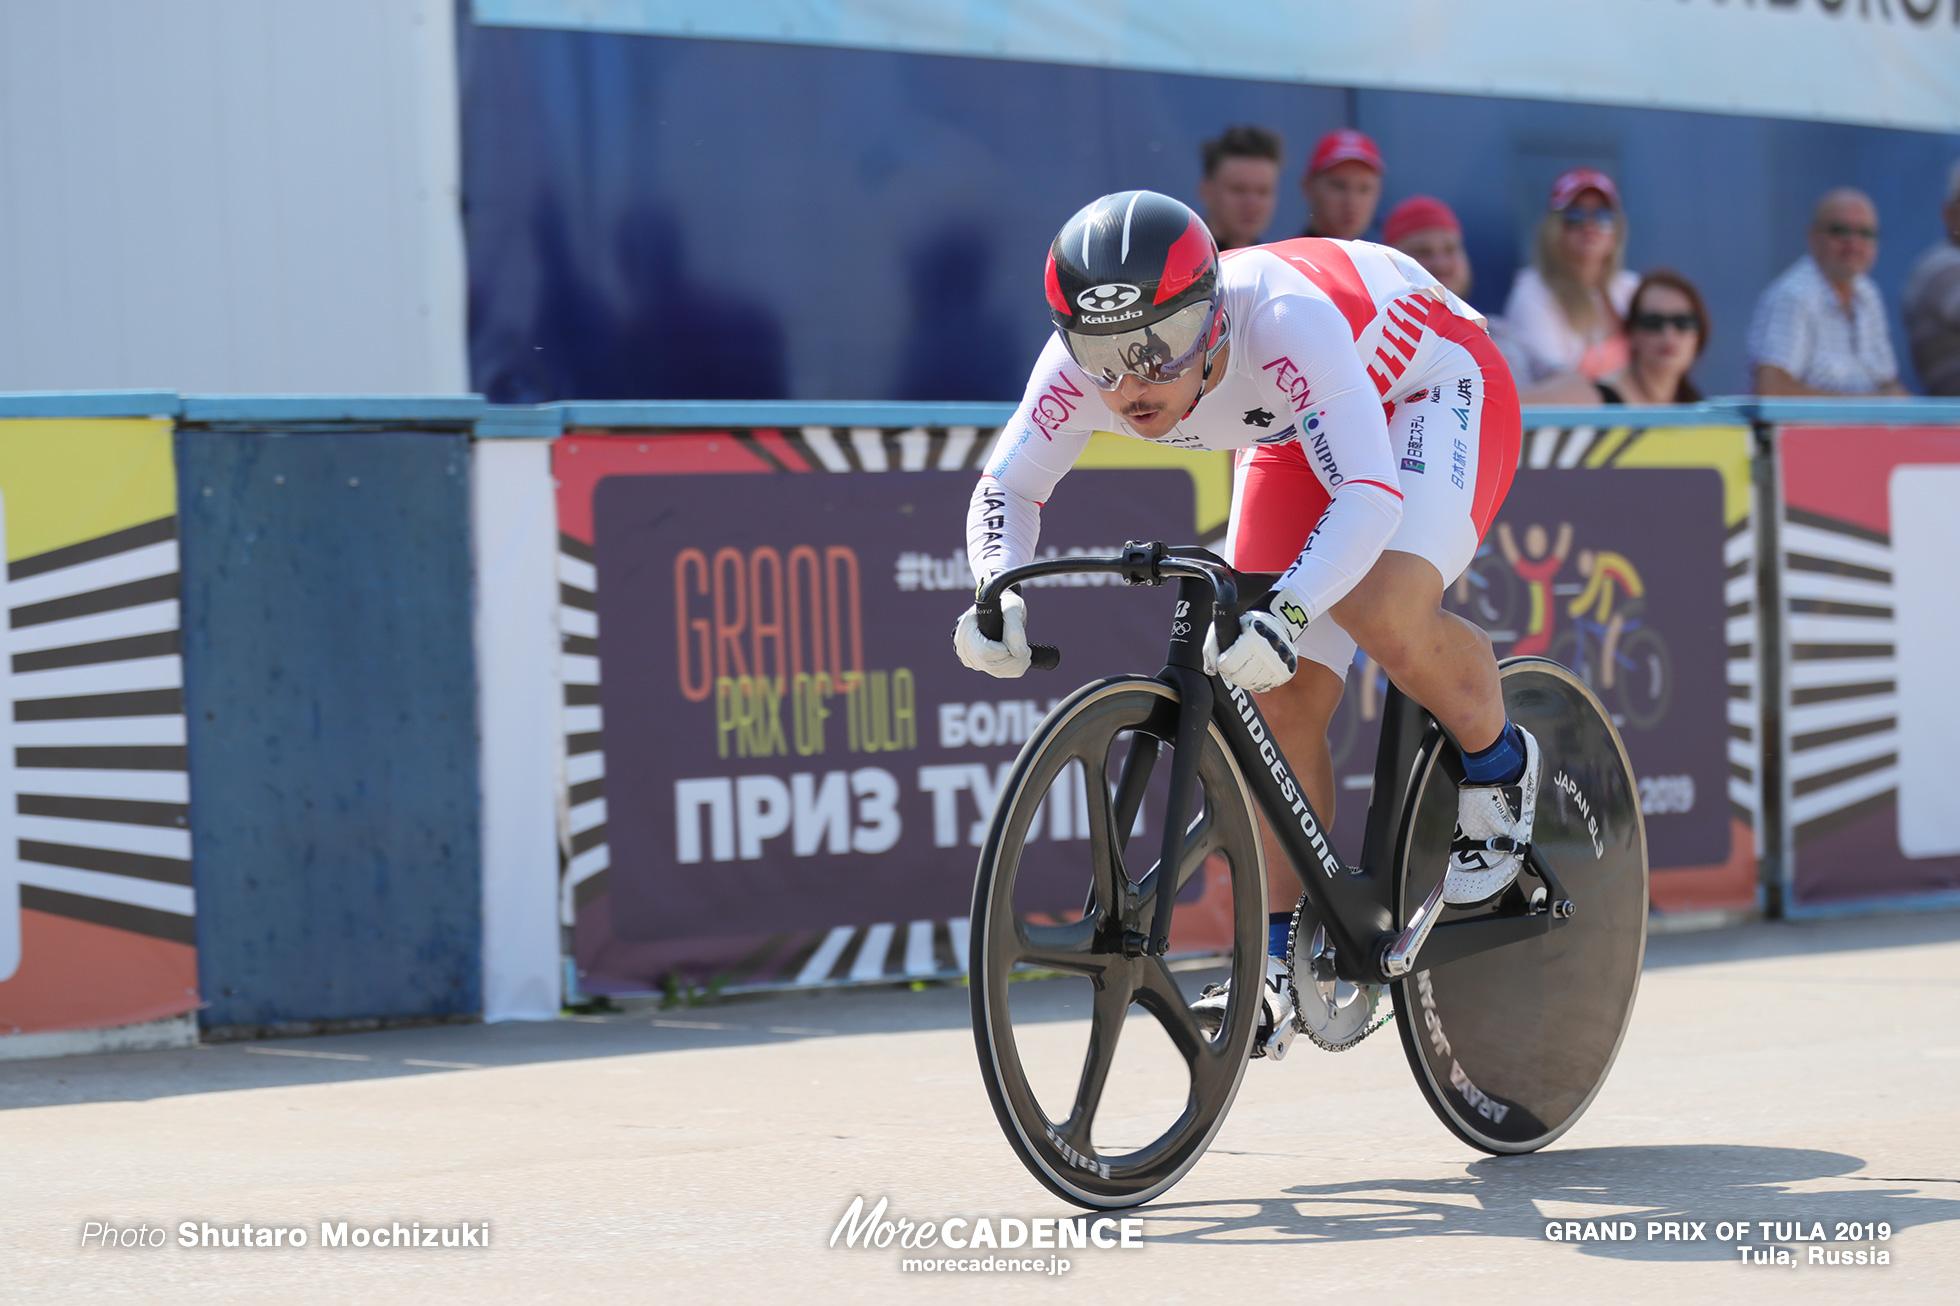 Men's Sprint Qualifying / GRAND PRIX OF TULA 2019